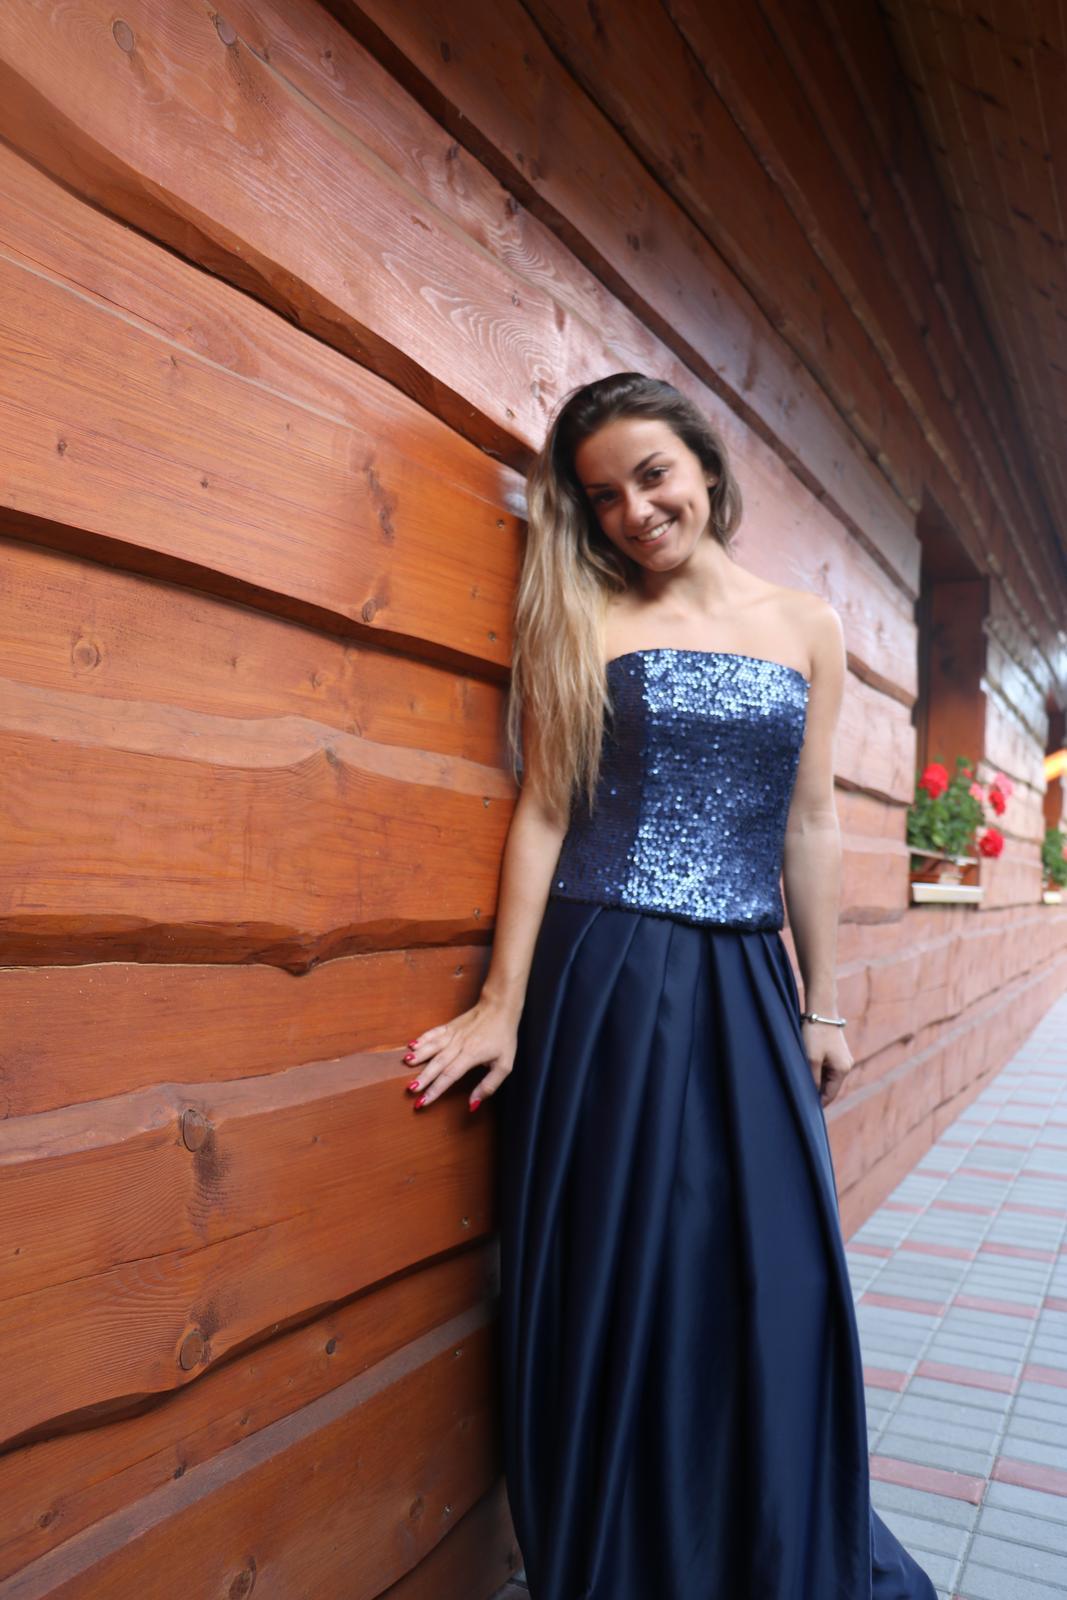 Luxusné spoločenské šaty Tmavomodré  - Obrázok č. 1